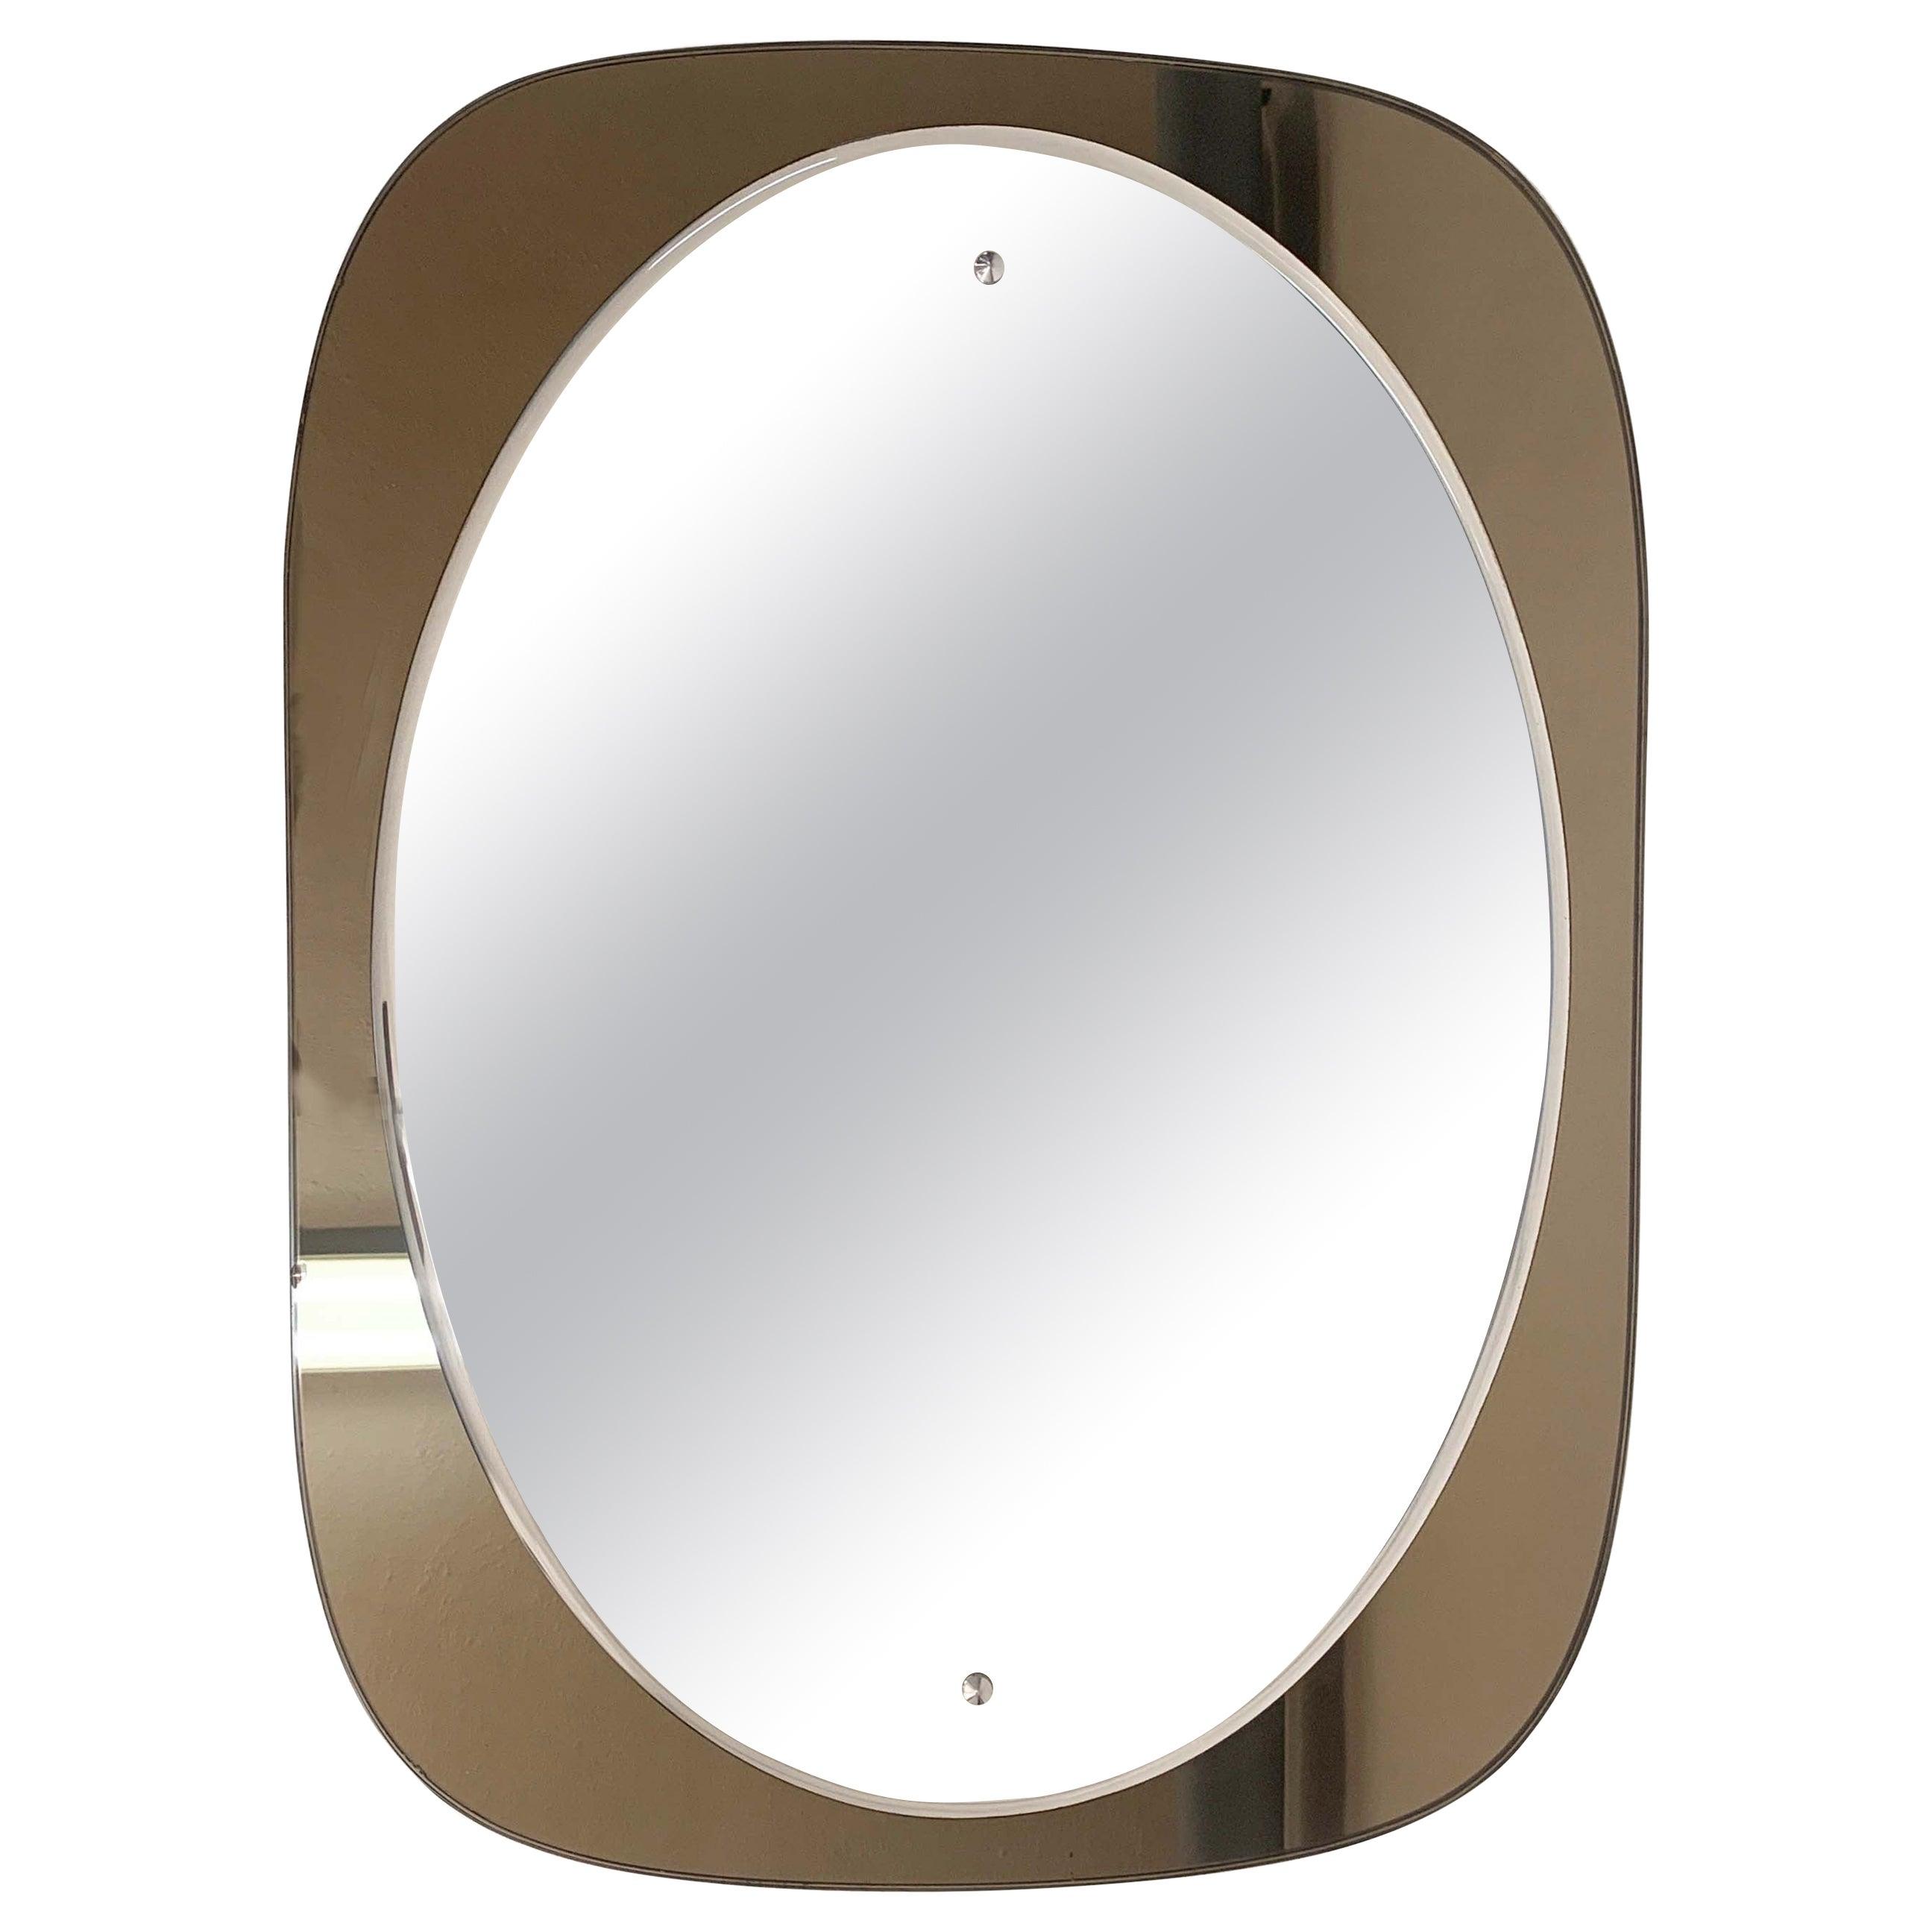 Veca Midcentury Italian Oval Wall Mirror with Bronze Glass Frame, 1960s